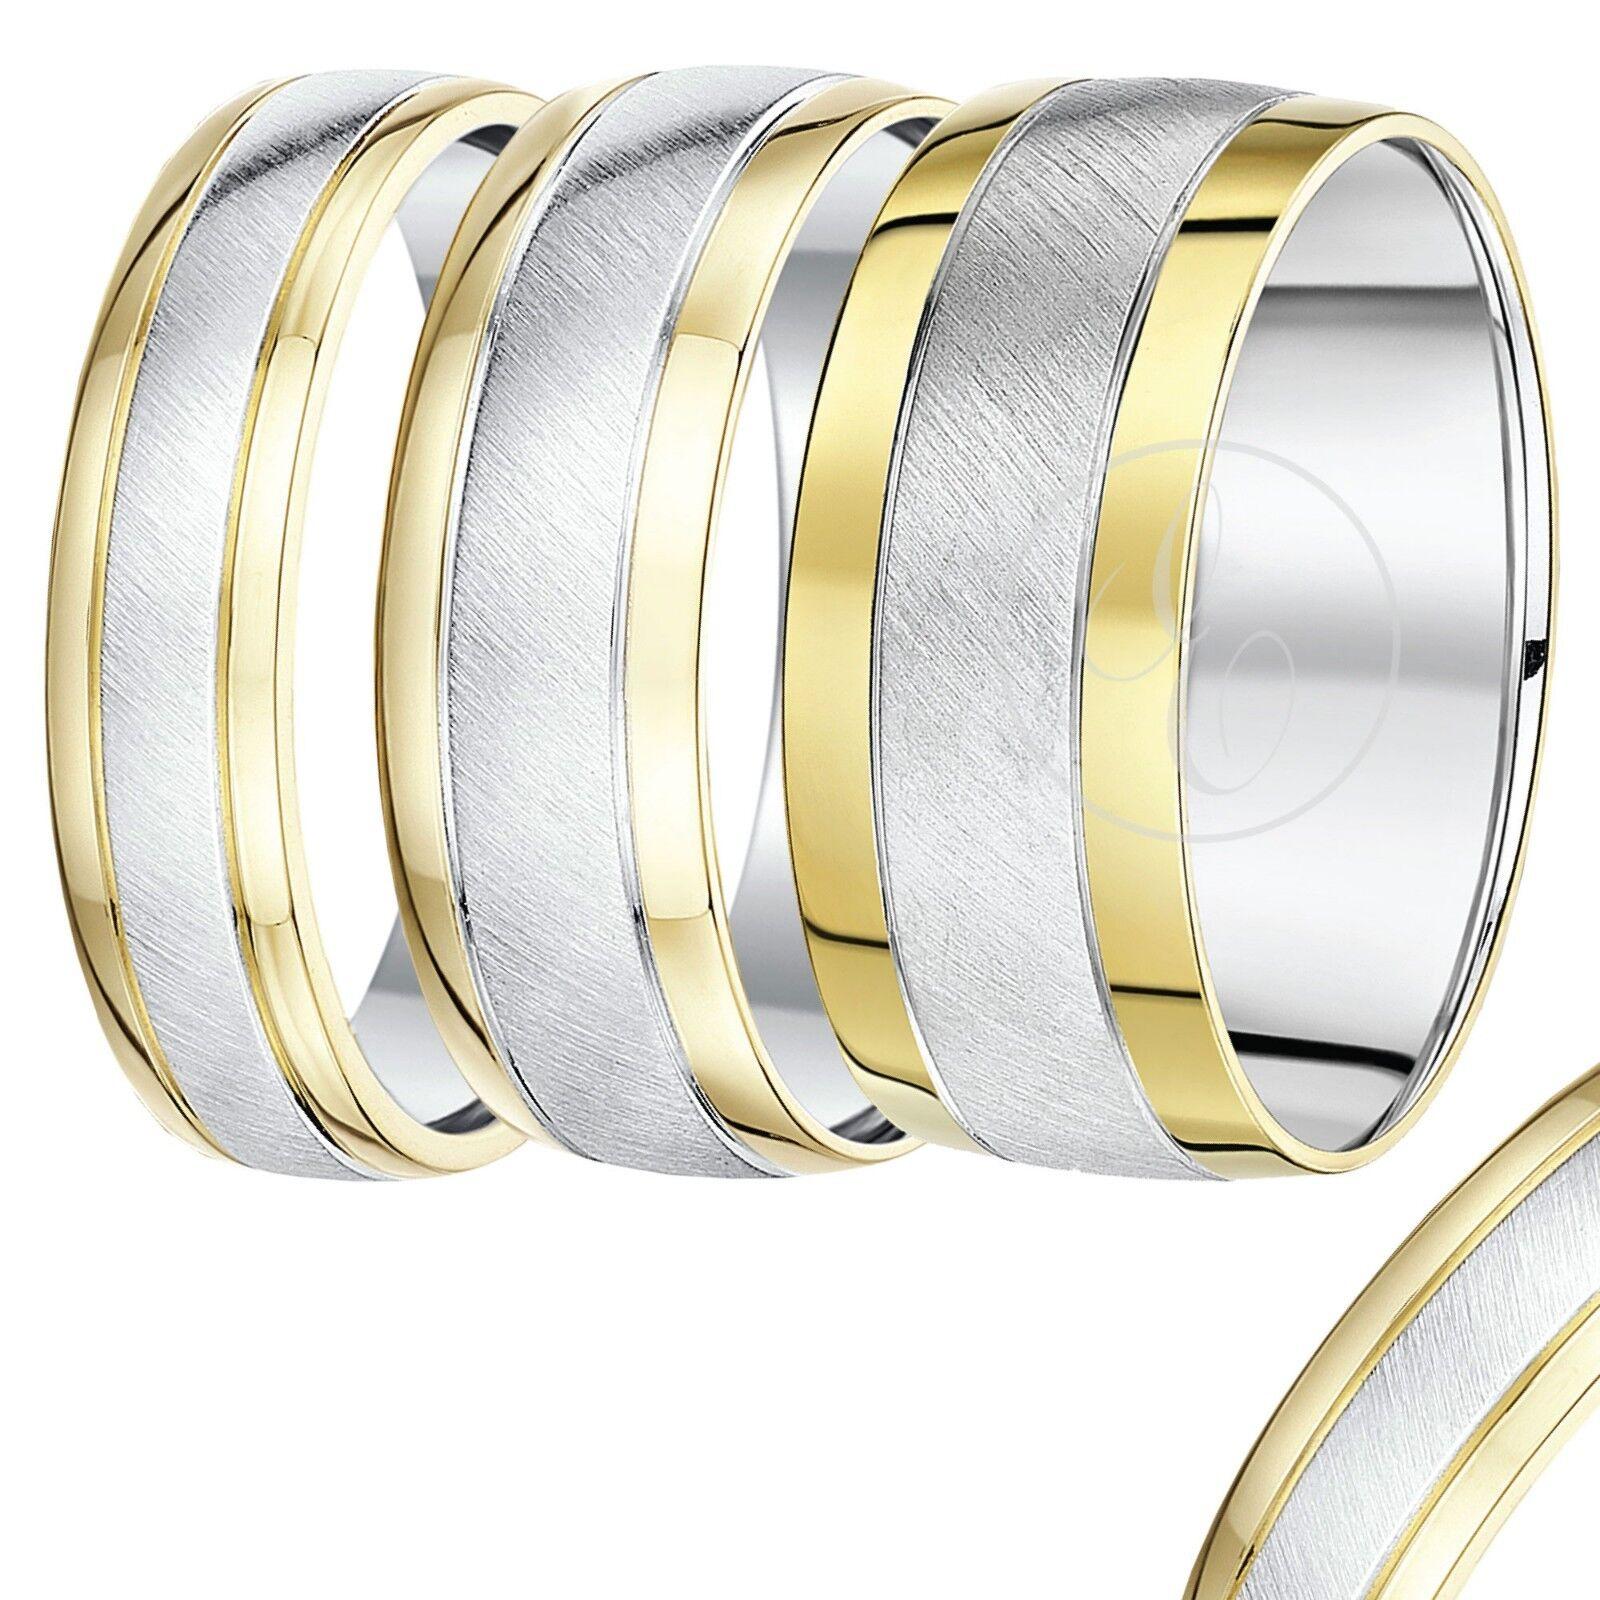 9 Karat yellow gold silver Zweifarbig Trauring 5mm,6mm,7mm,8mm